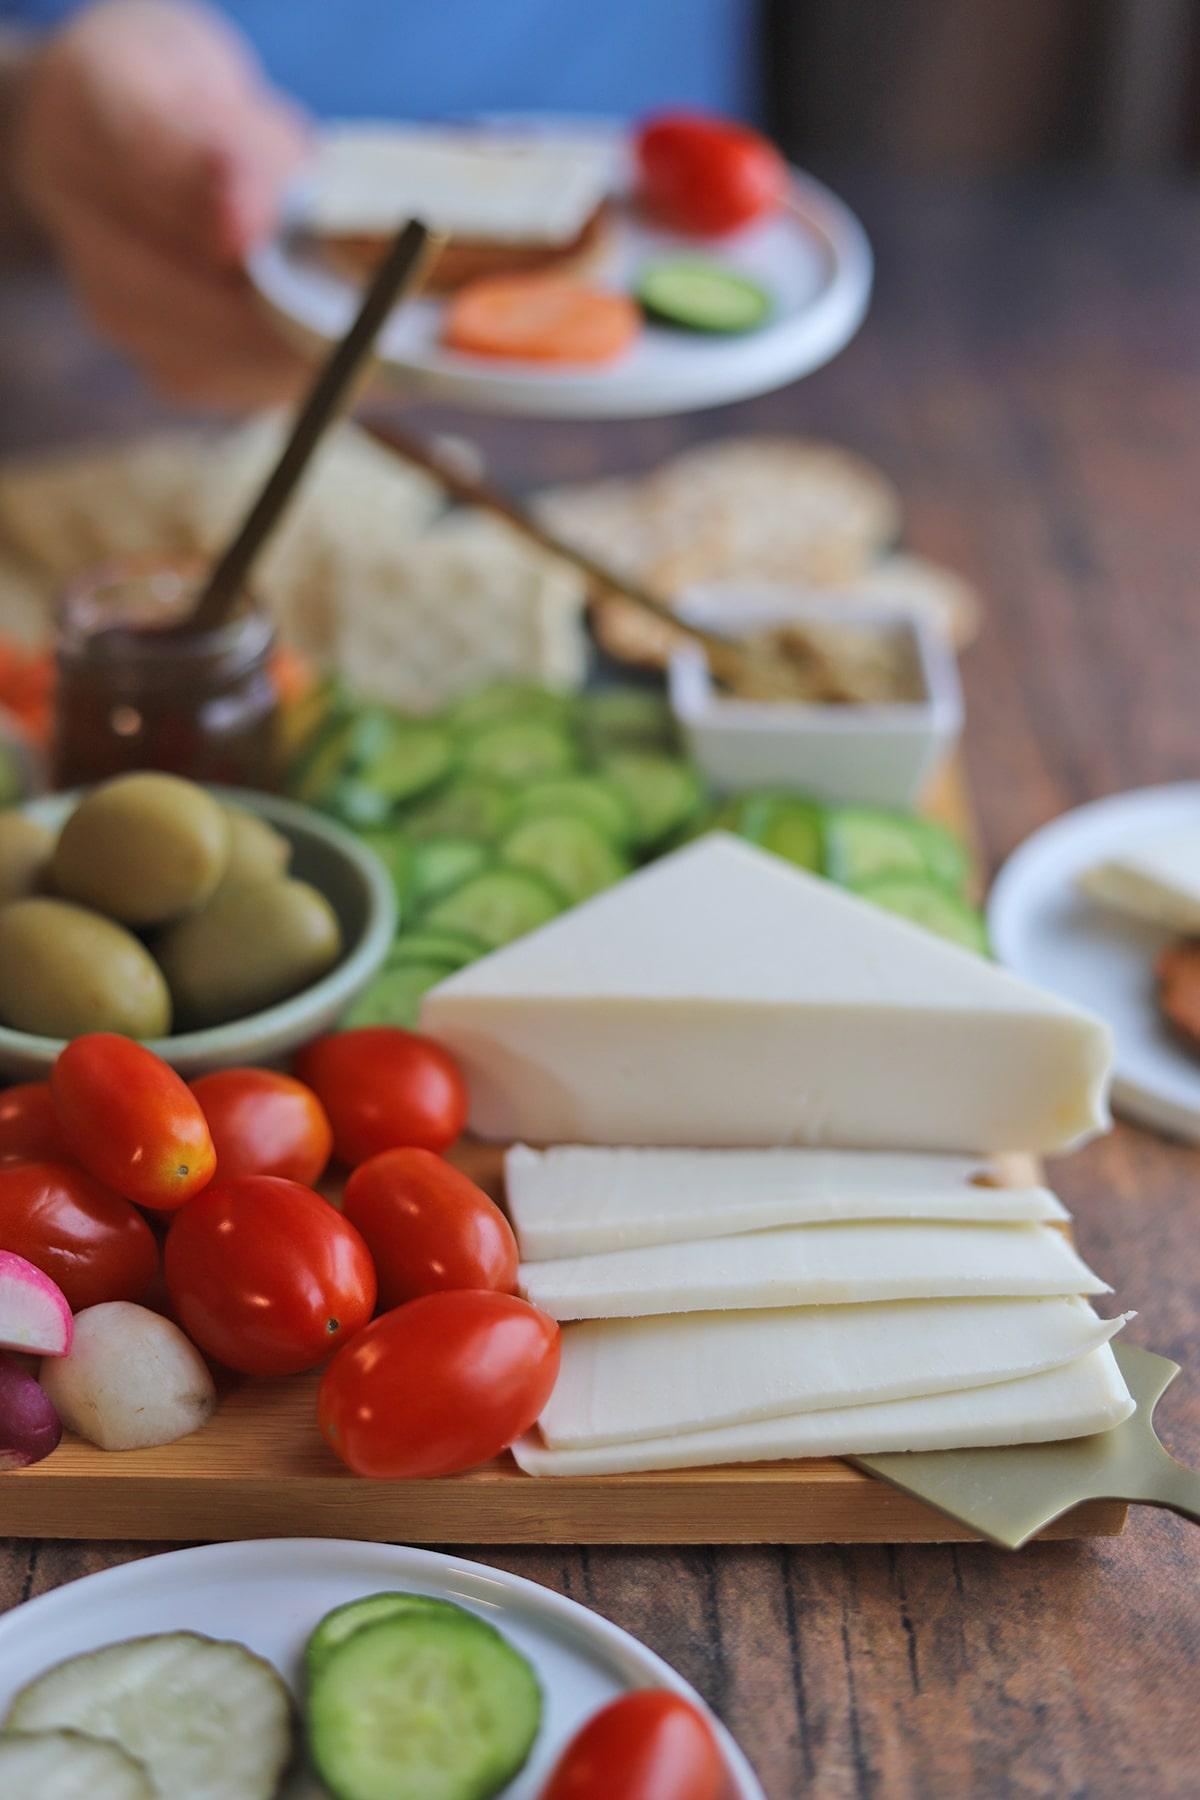 Slices of vegan Swiss cheese on cheeseboard.